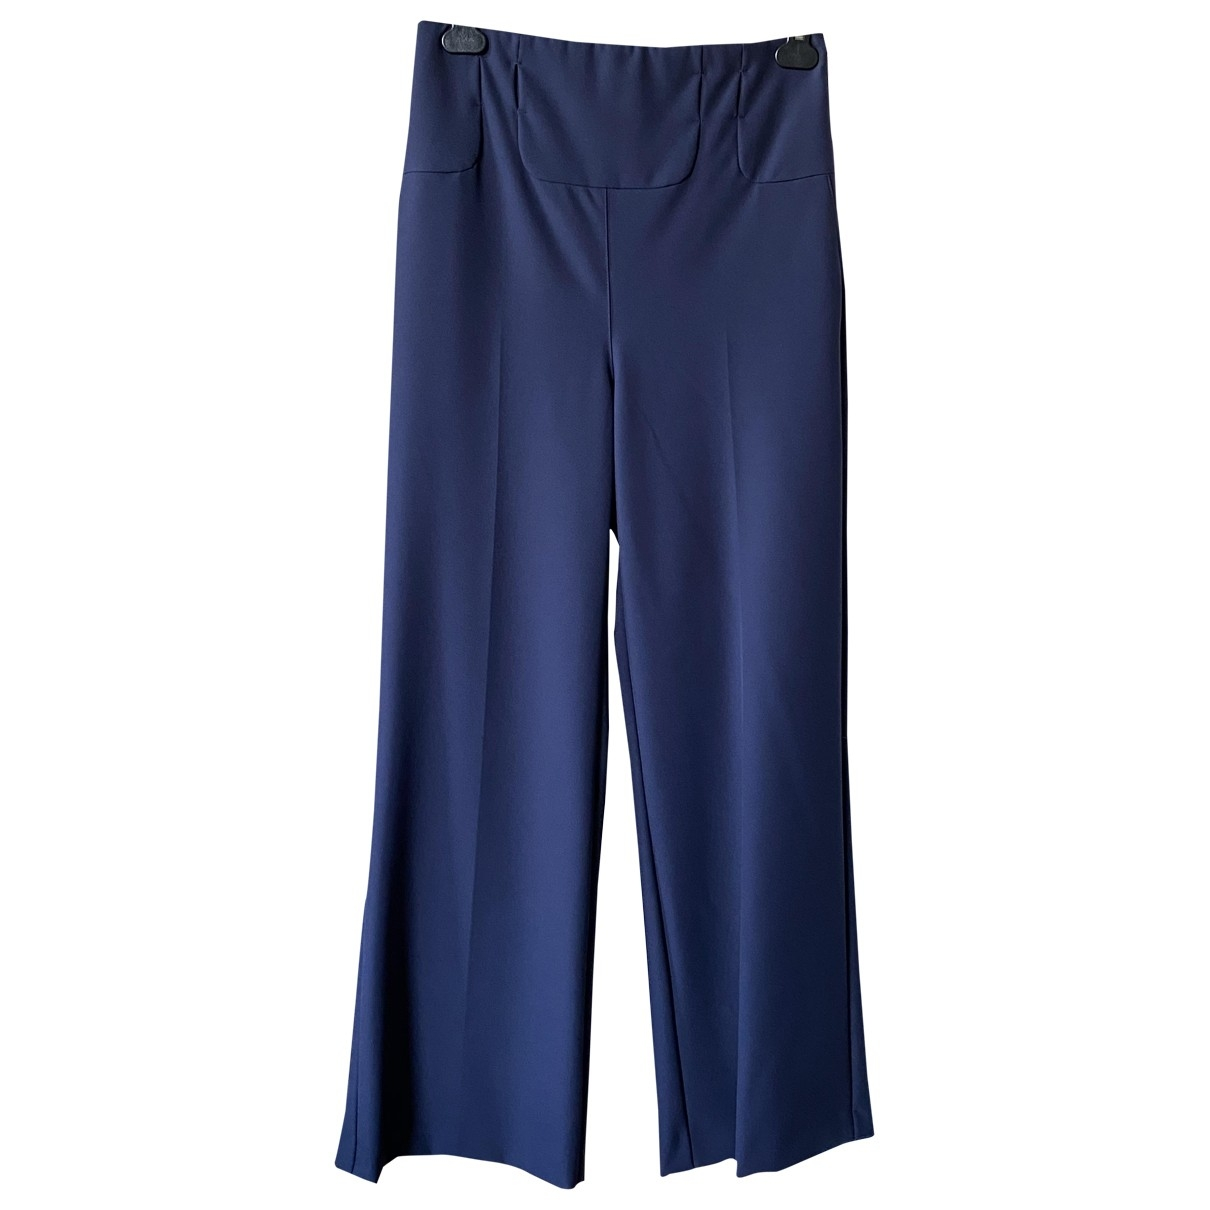 Patrizia Pepe \N Blue Trousers for Women 44 IT